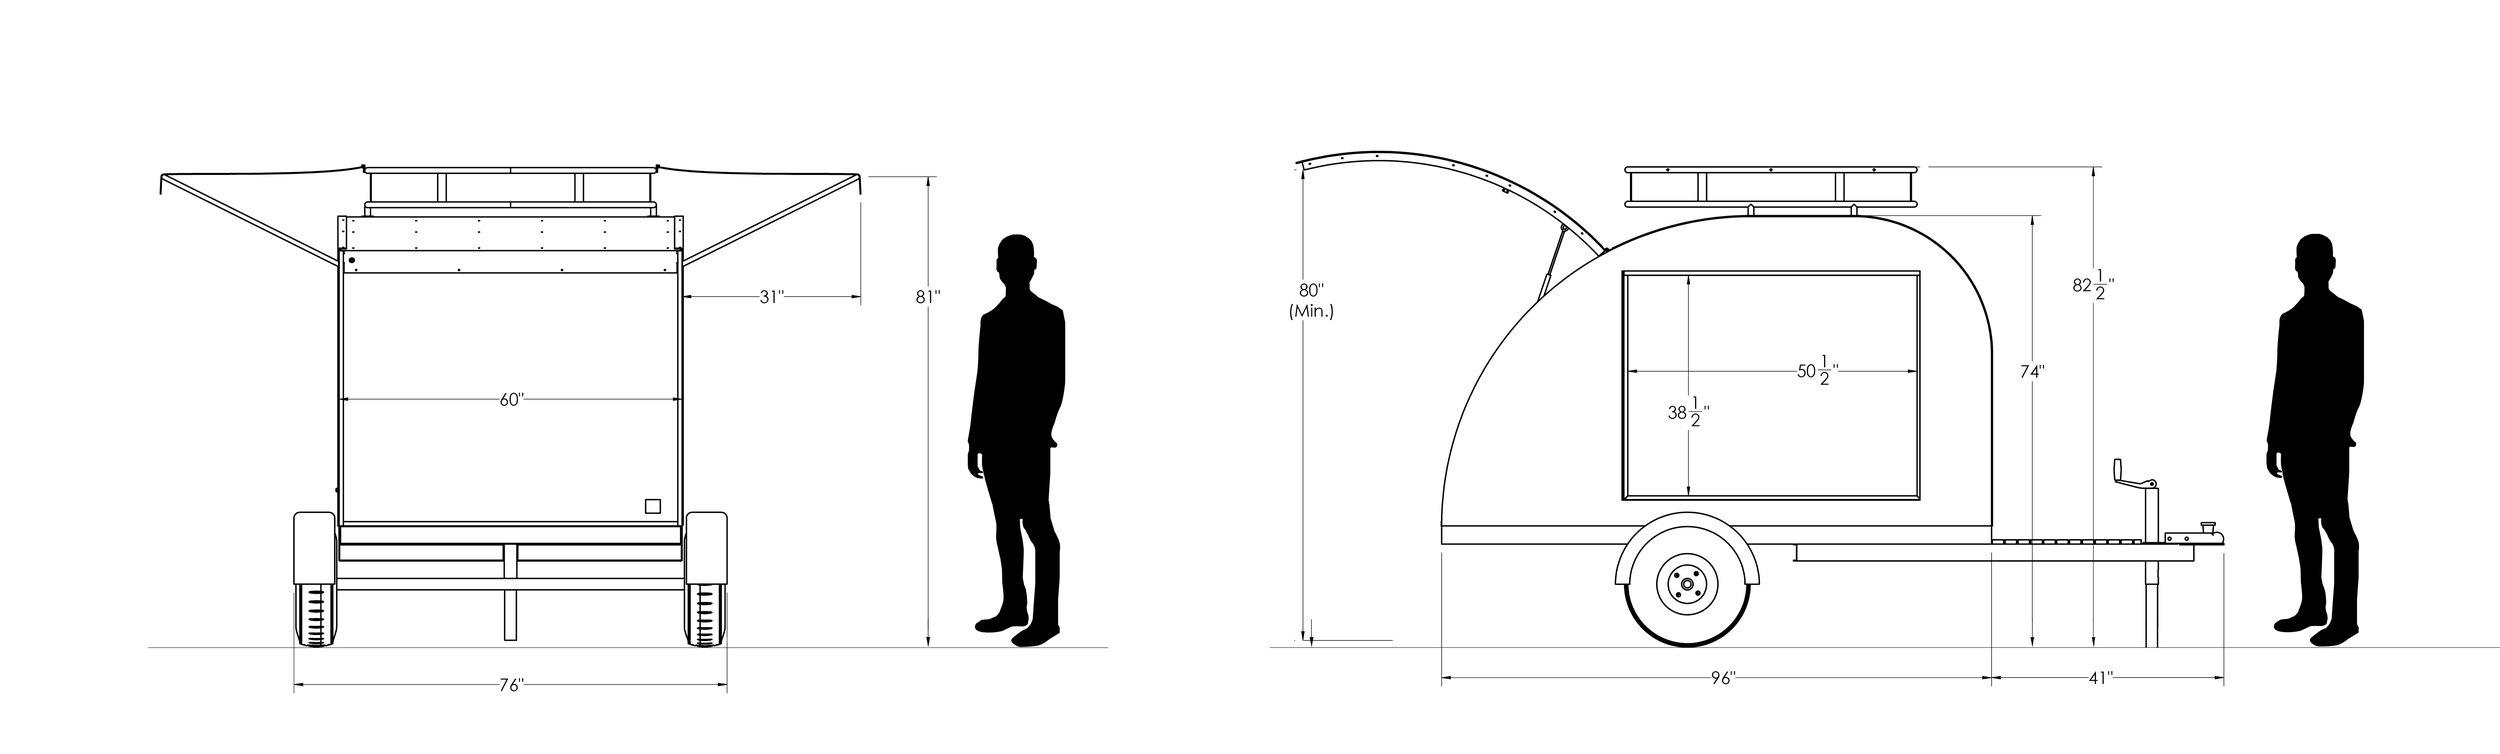 Caravan-Dimensions-1.jpg